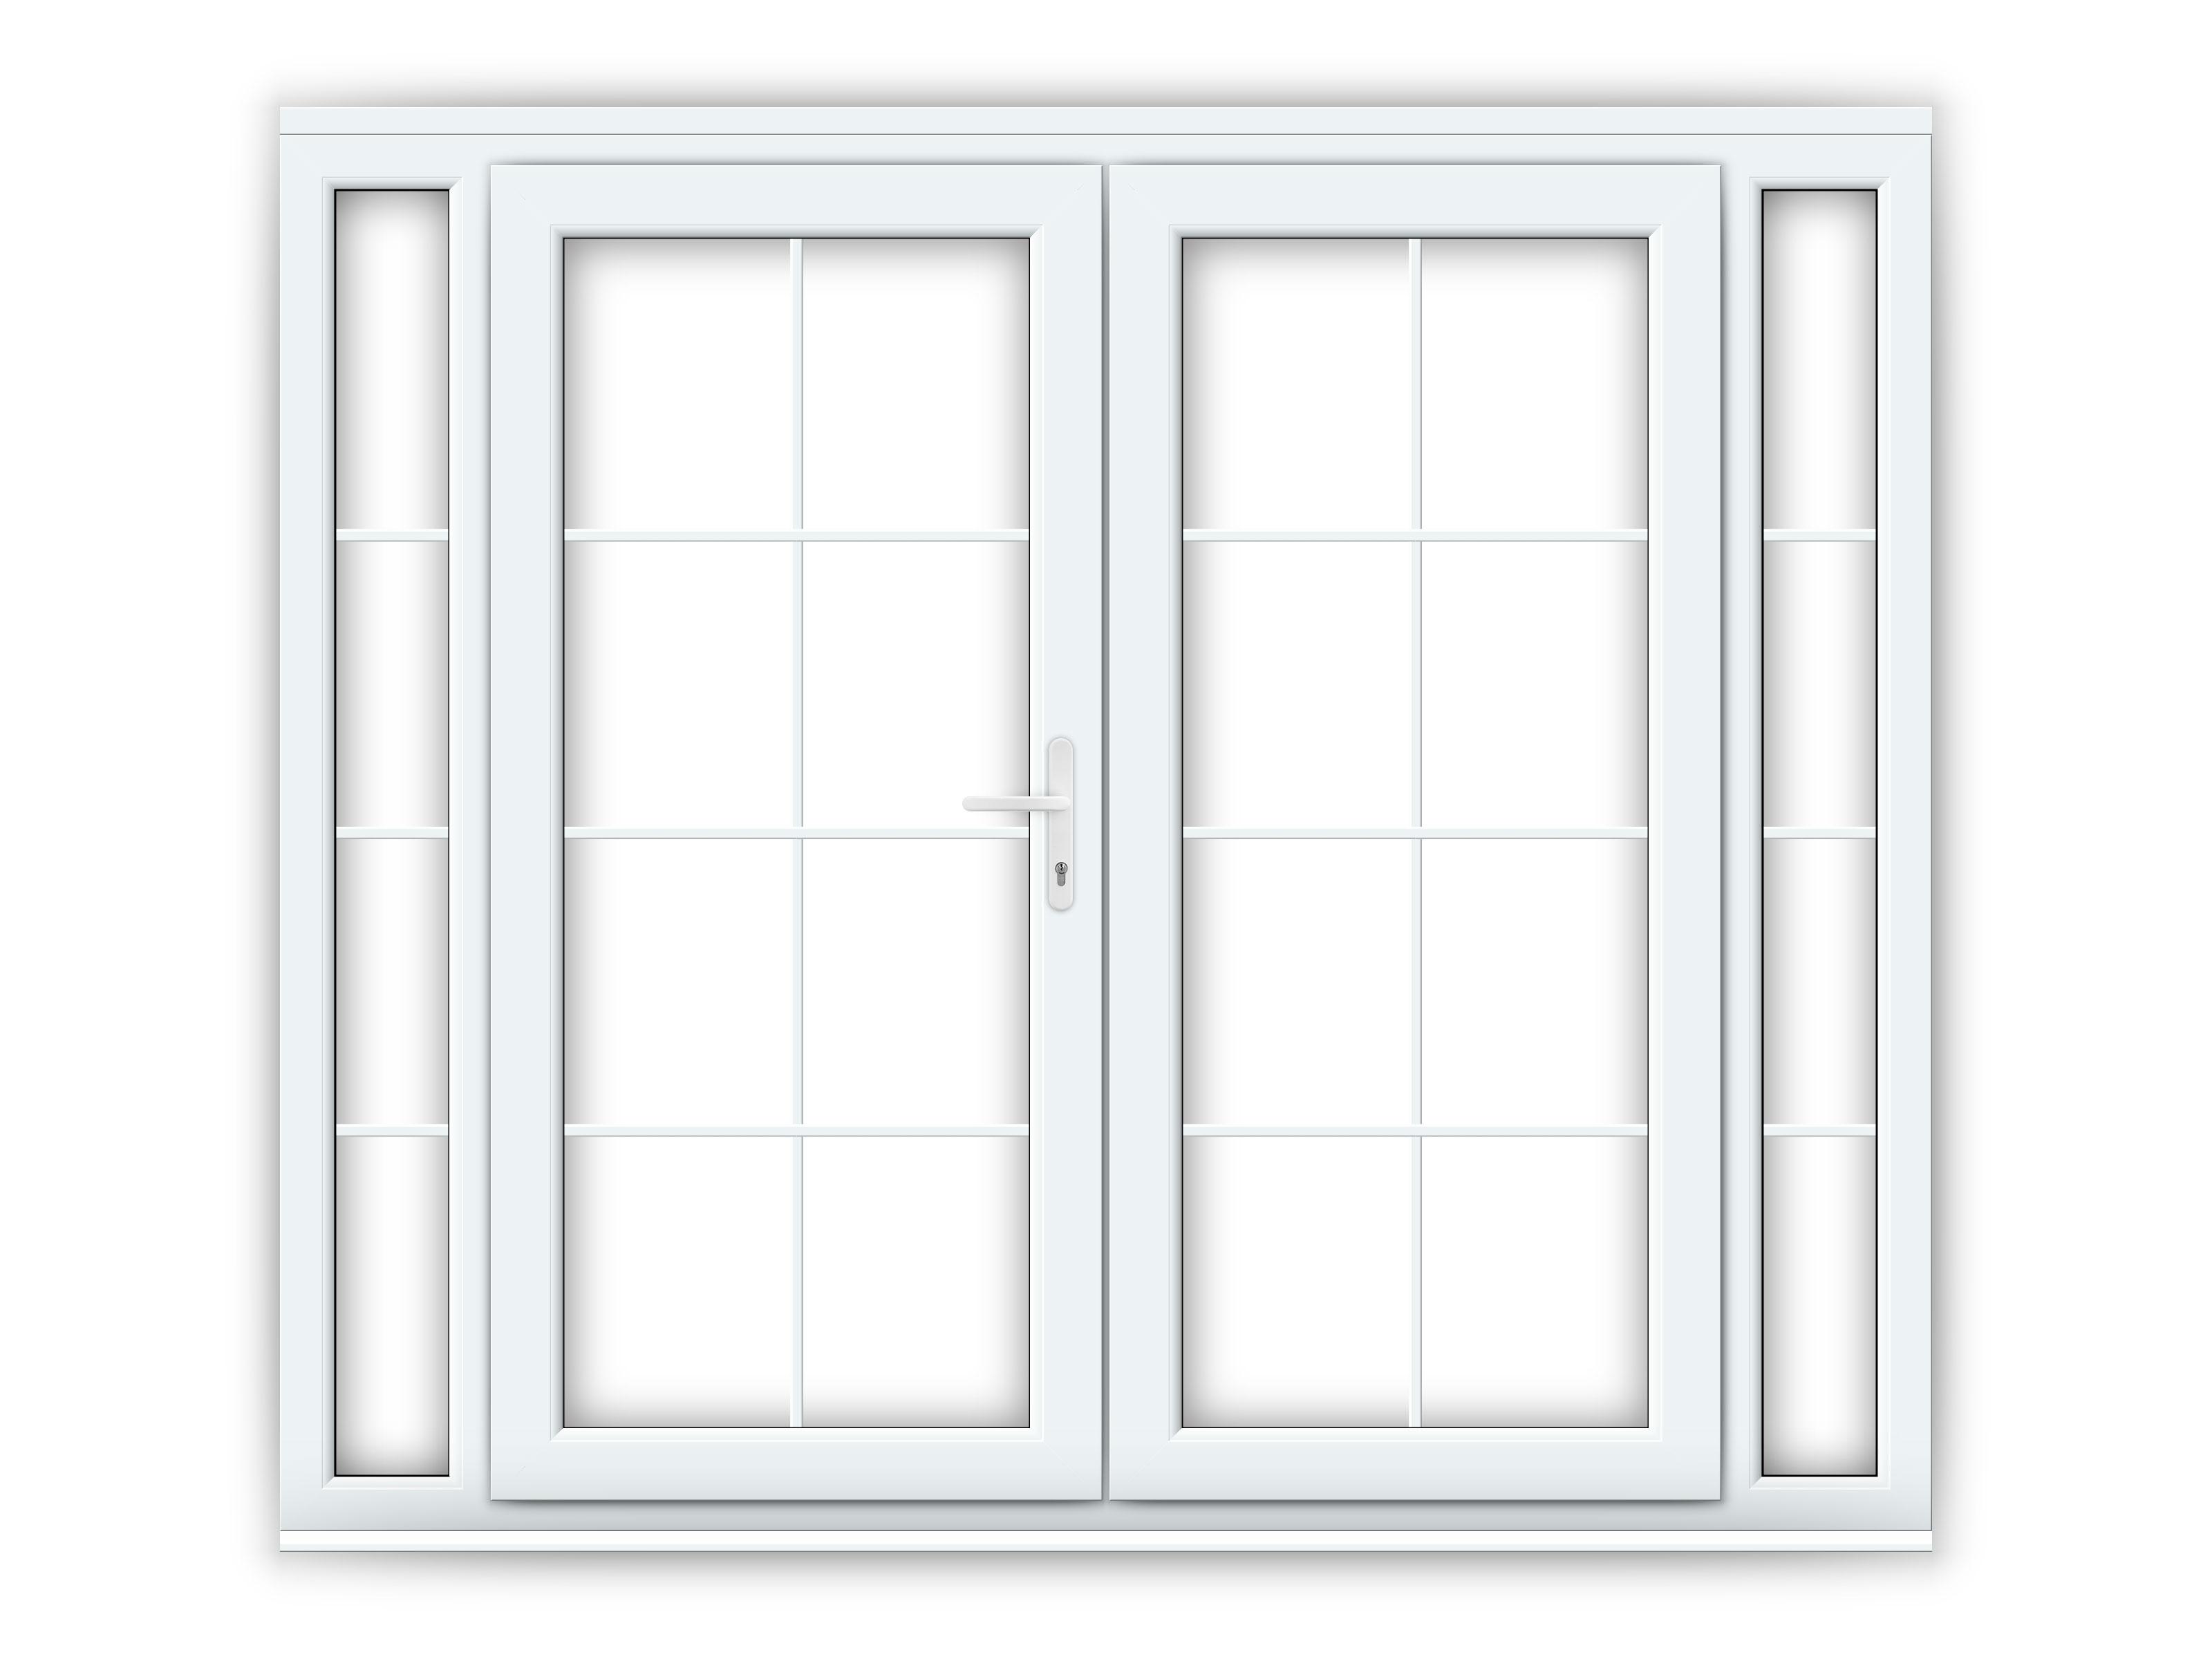 6ft upvc georgian french doors with 2 narrow upvc side panels flying doors. Black Bedroom Furniture Sets. Home Design Ideas